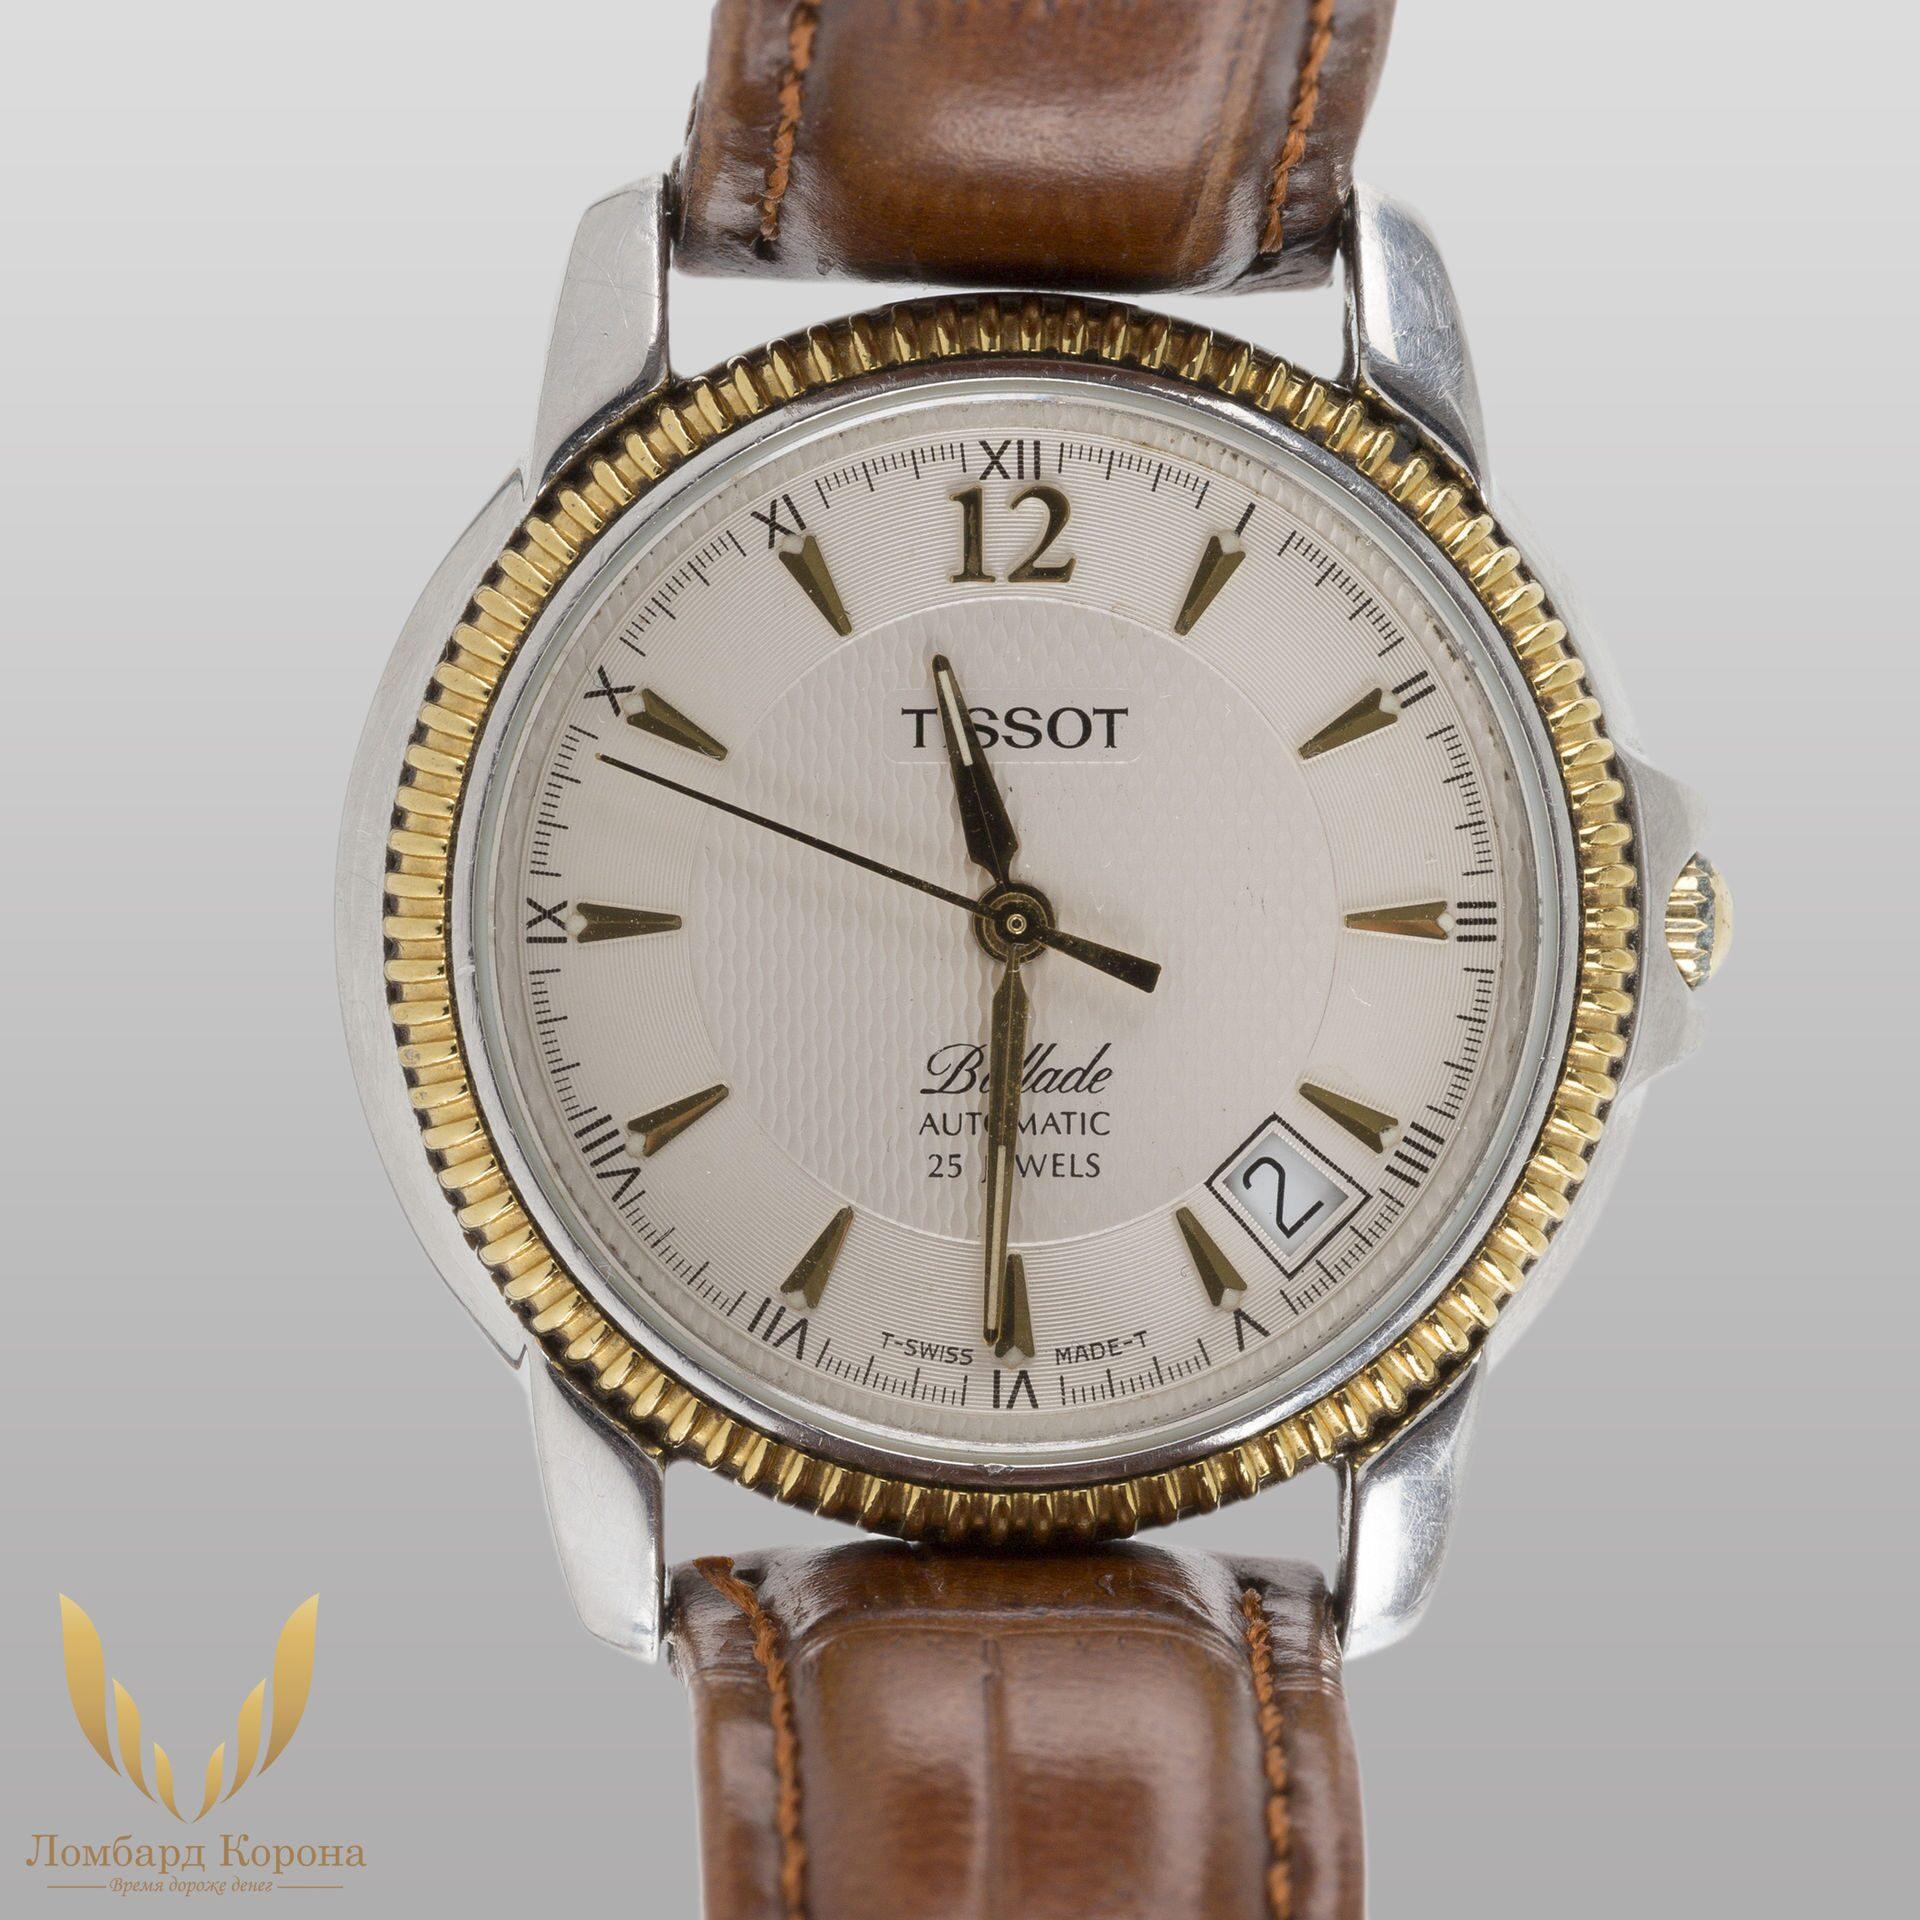 Tissot ломбард москва часы часов alberto kavalli стоимость